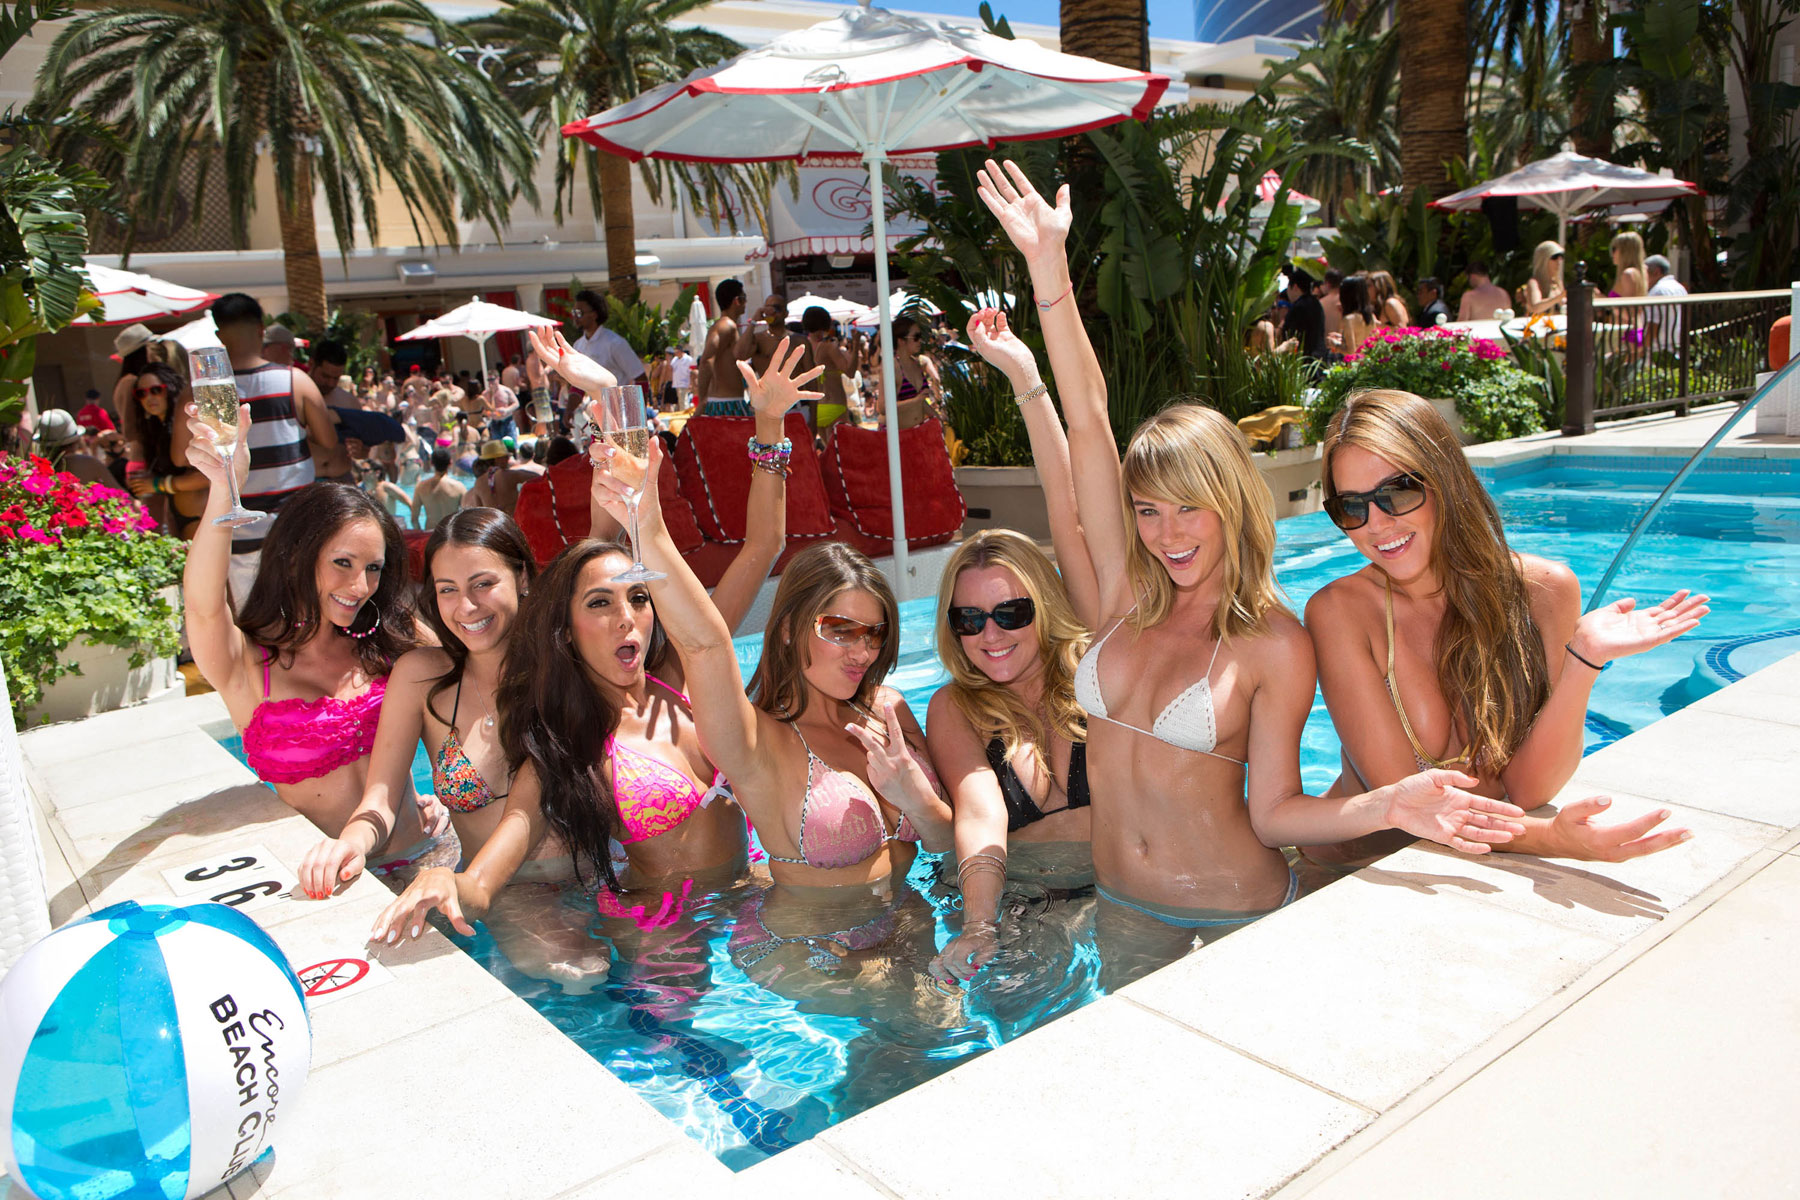 Las vegas casino nude beach lucky derby casino ca